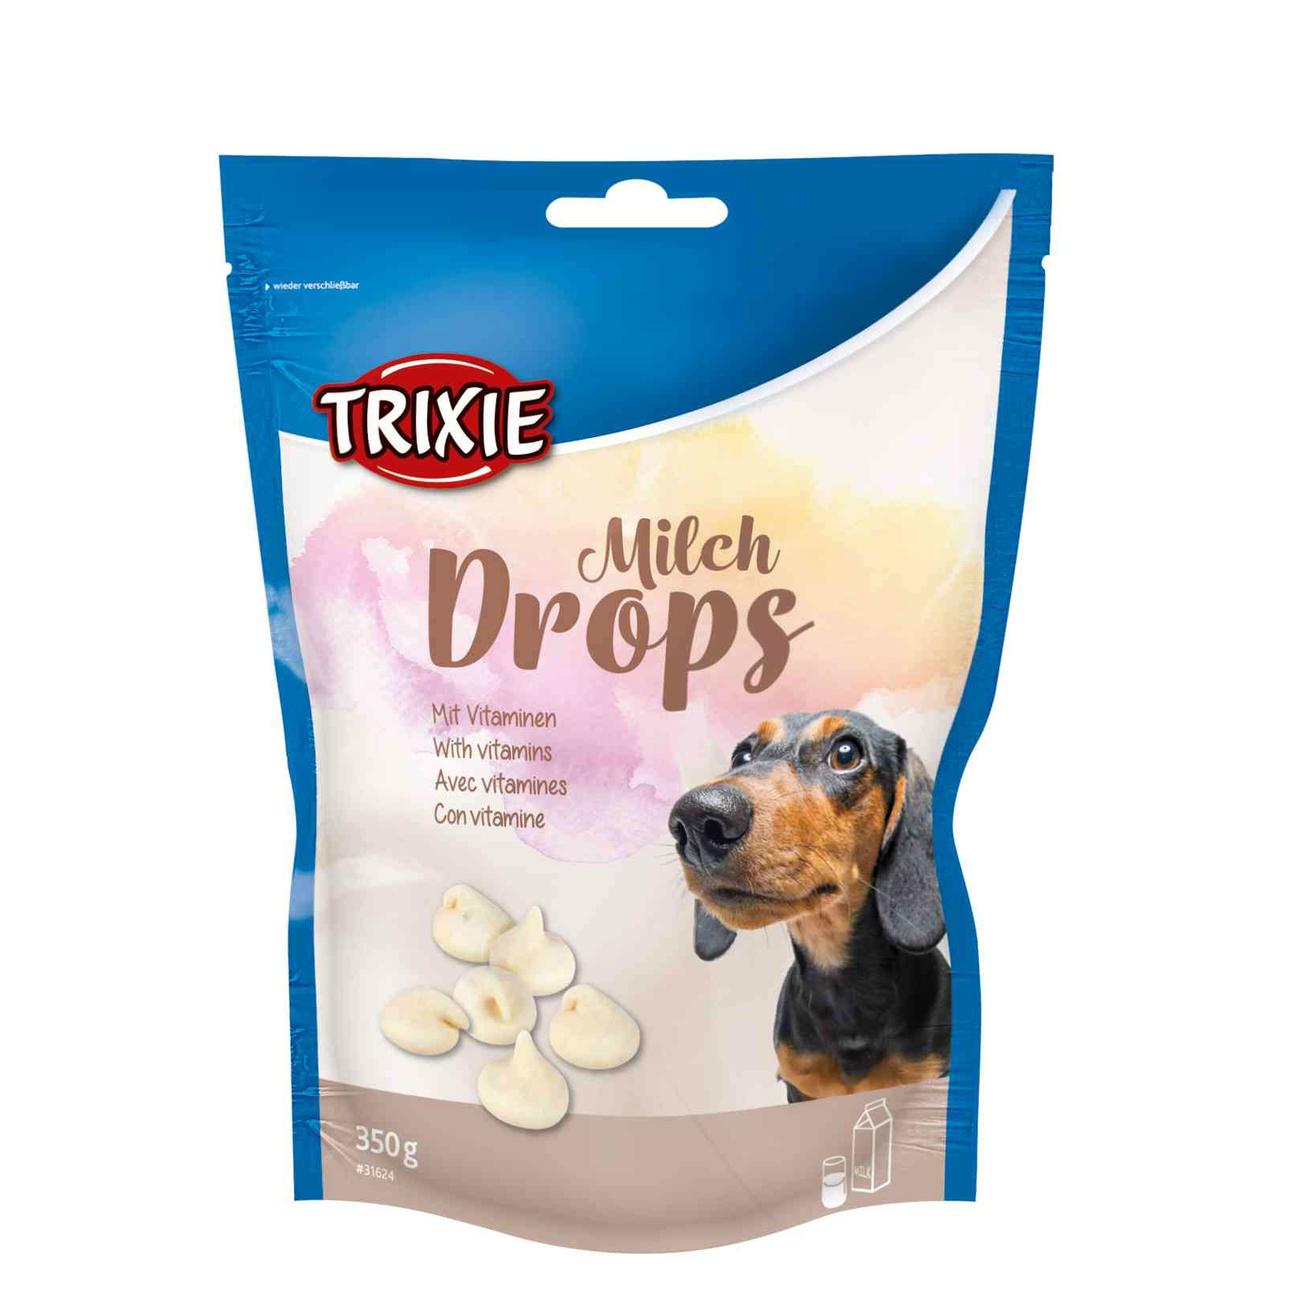 TRIXIE Hunde Milch-Drops 31621, Bild 3